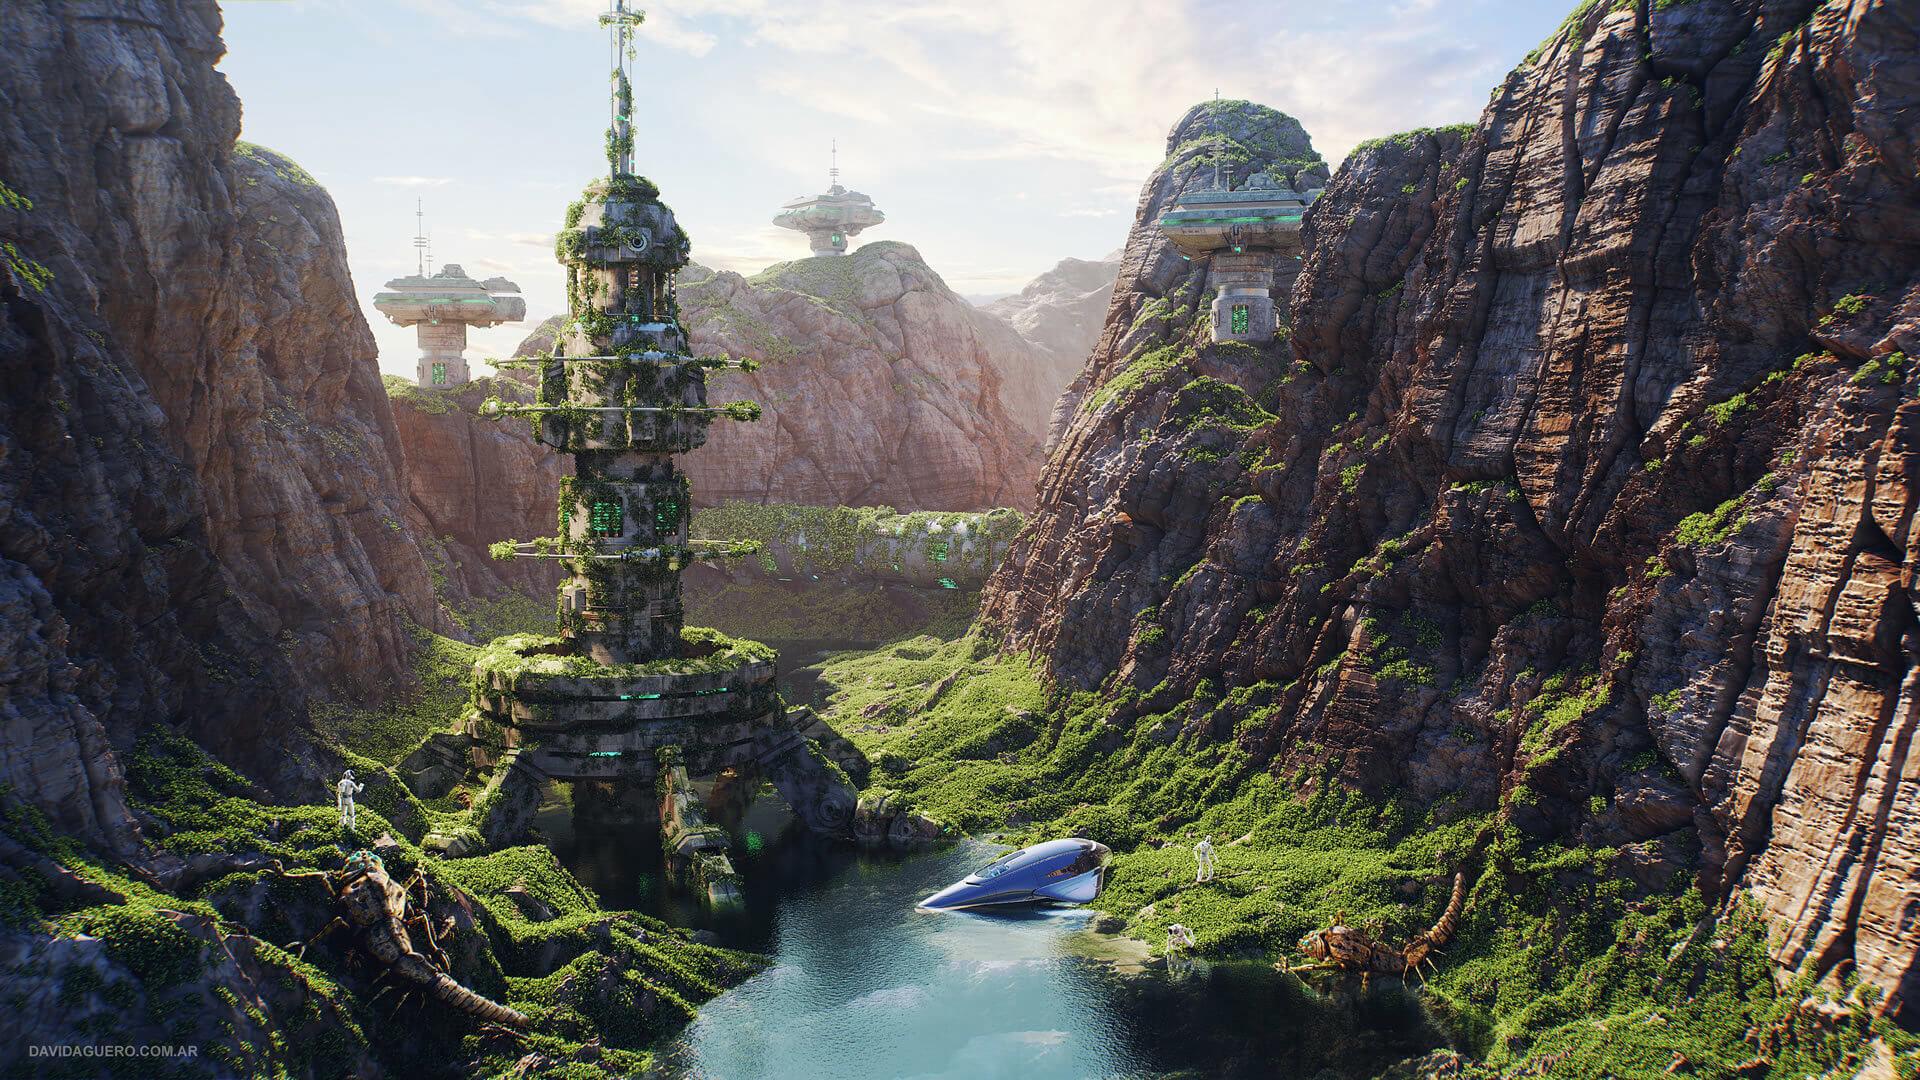 David Aguero - 'Alien Valley'